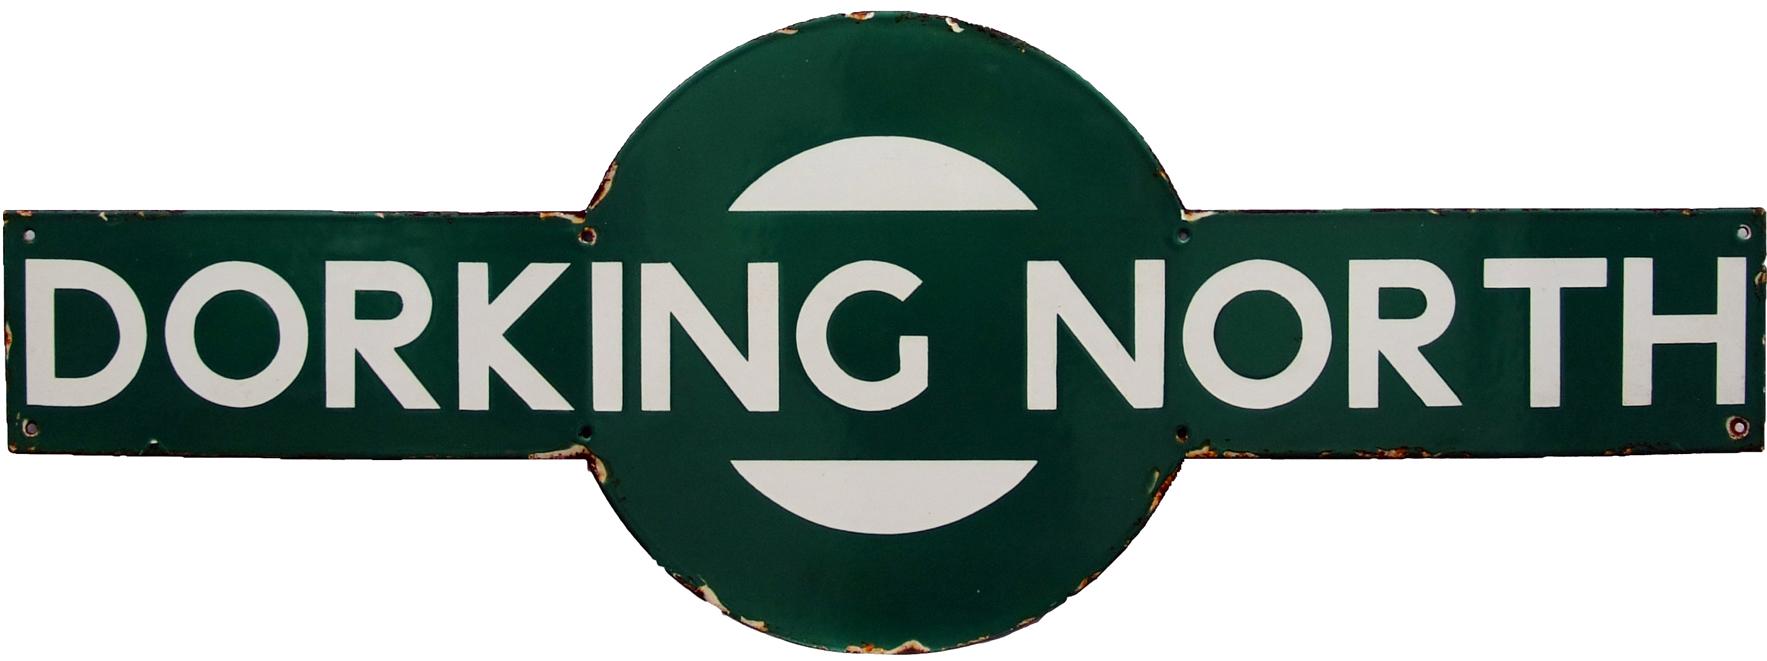 Southern Railway Target DORKING NORTH. Ex LBSCR